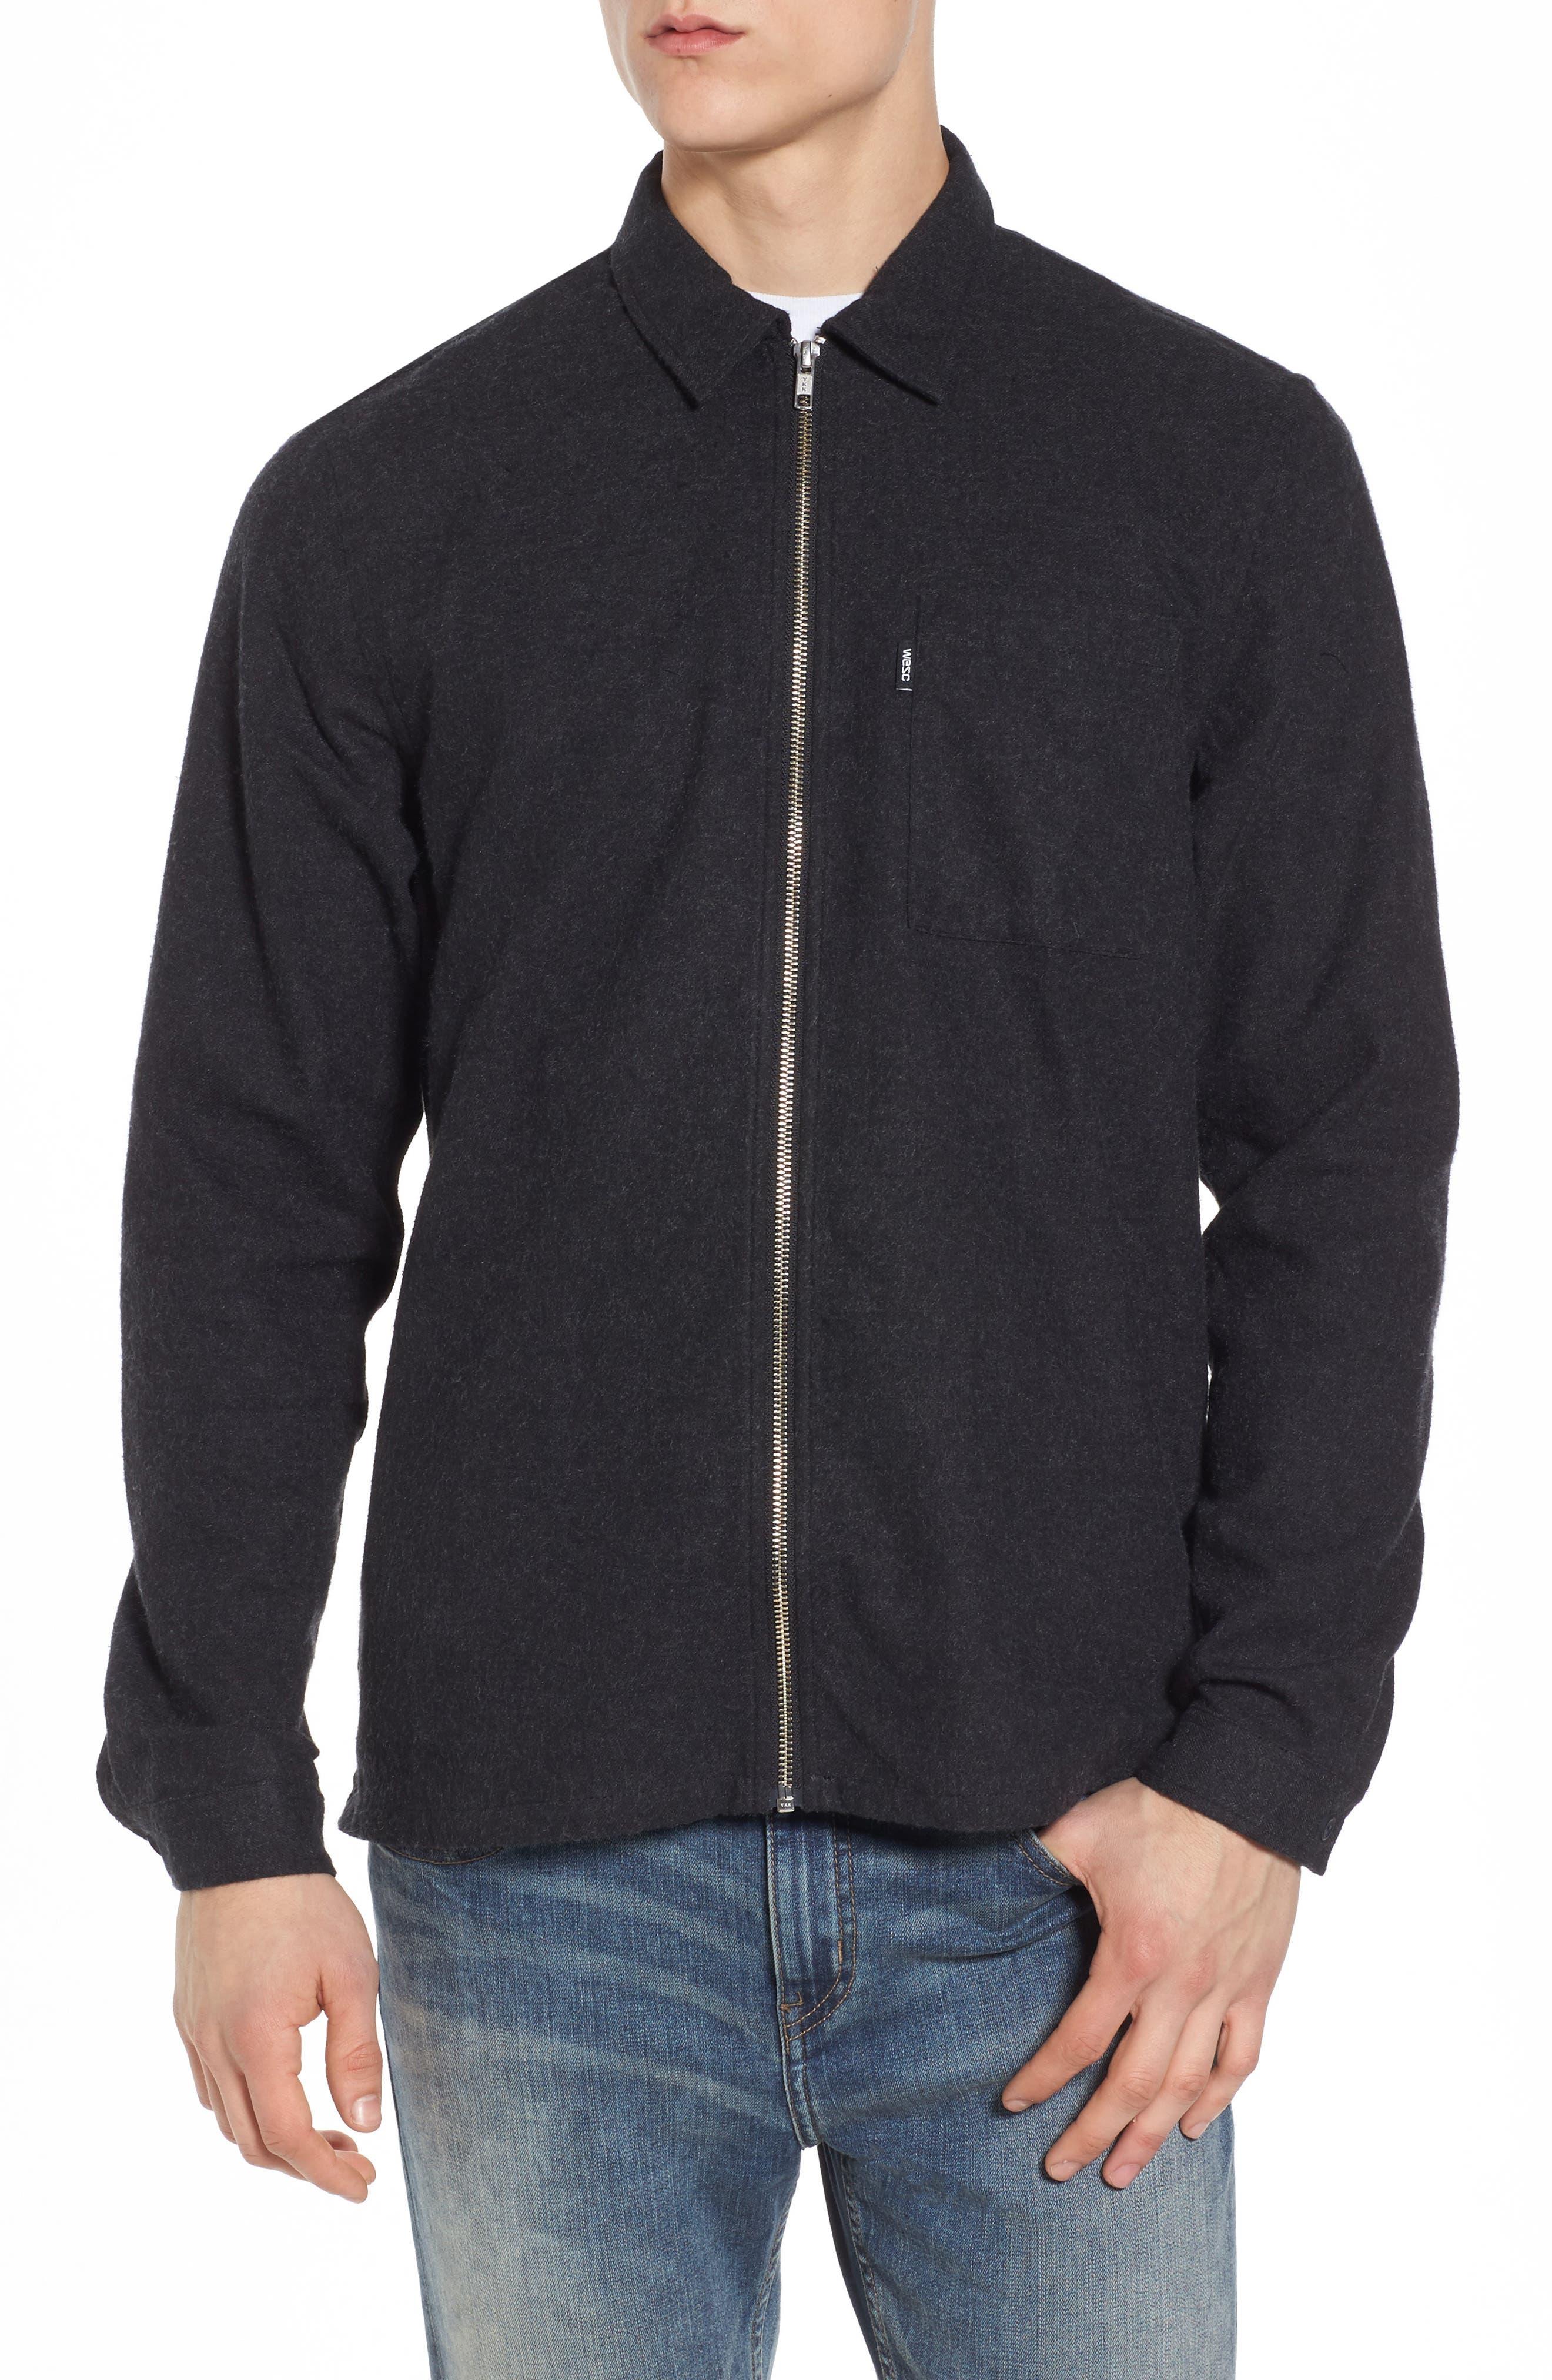 Alternate Image 1 Selected - WeSC Nicks Flannel Zip Overshirt